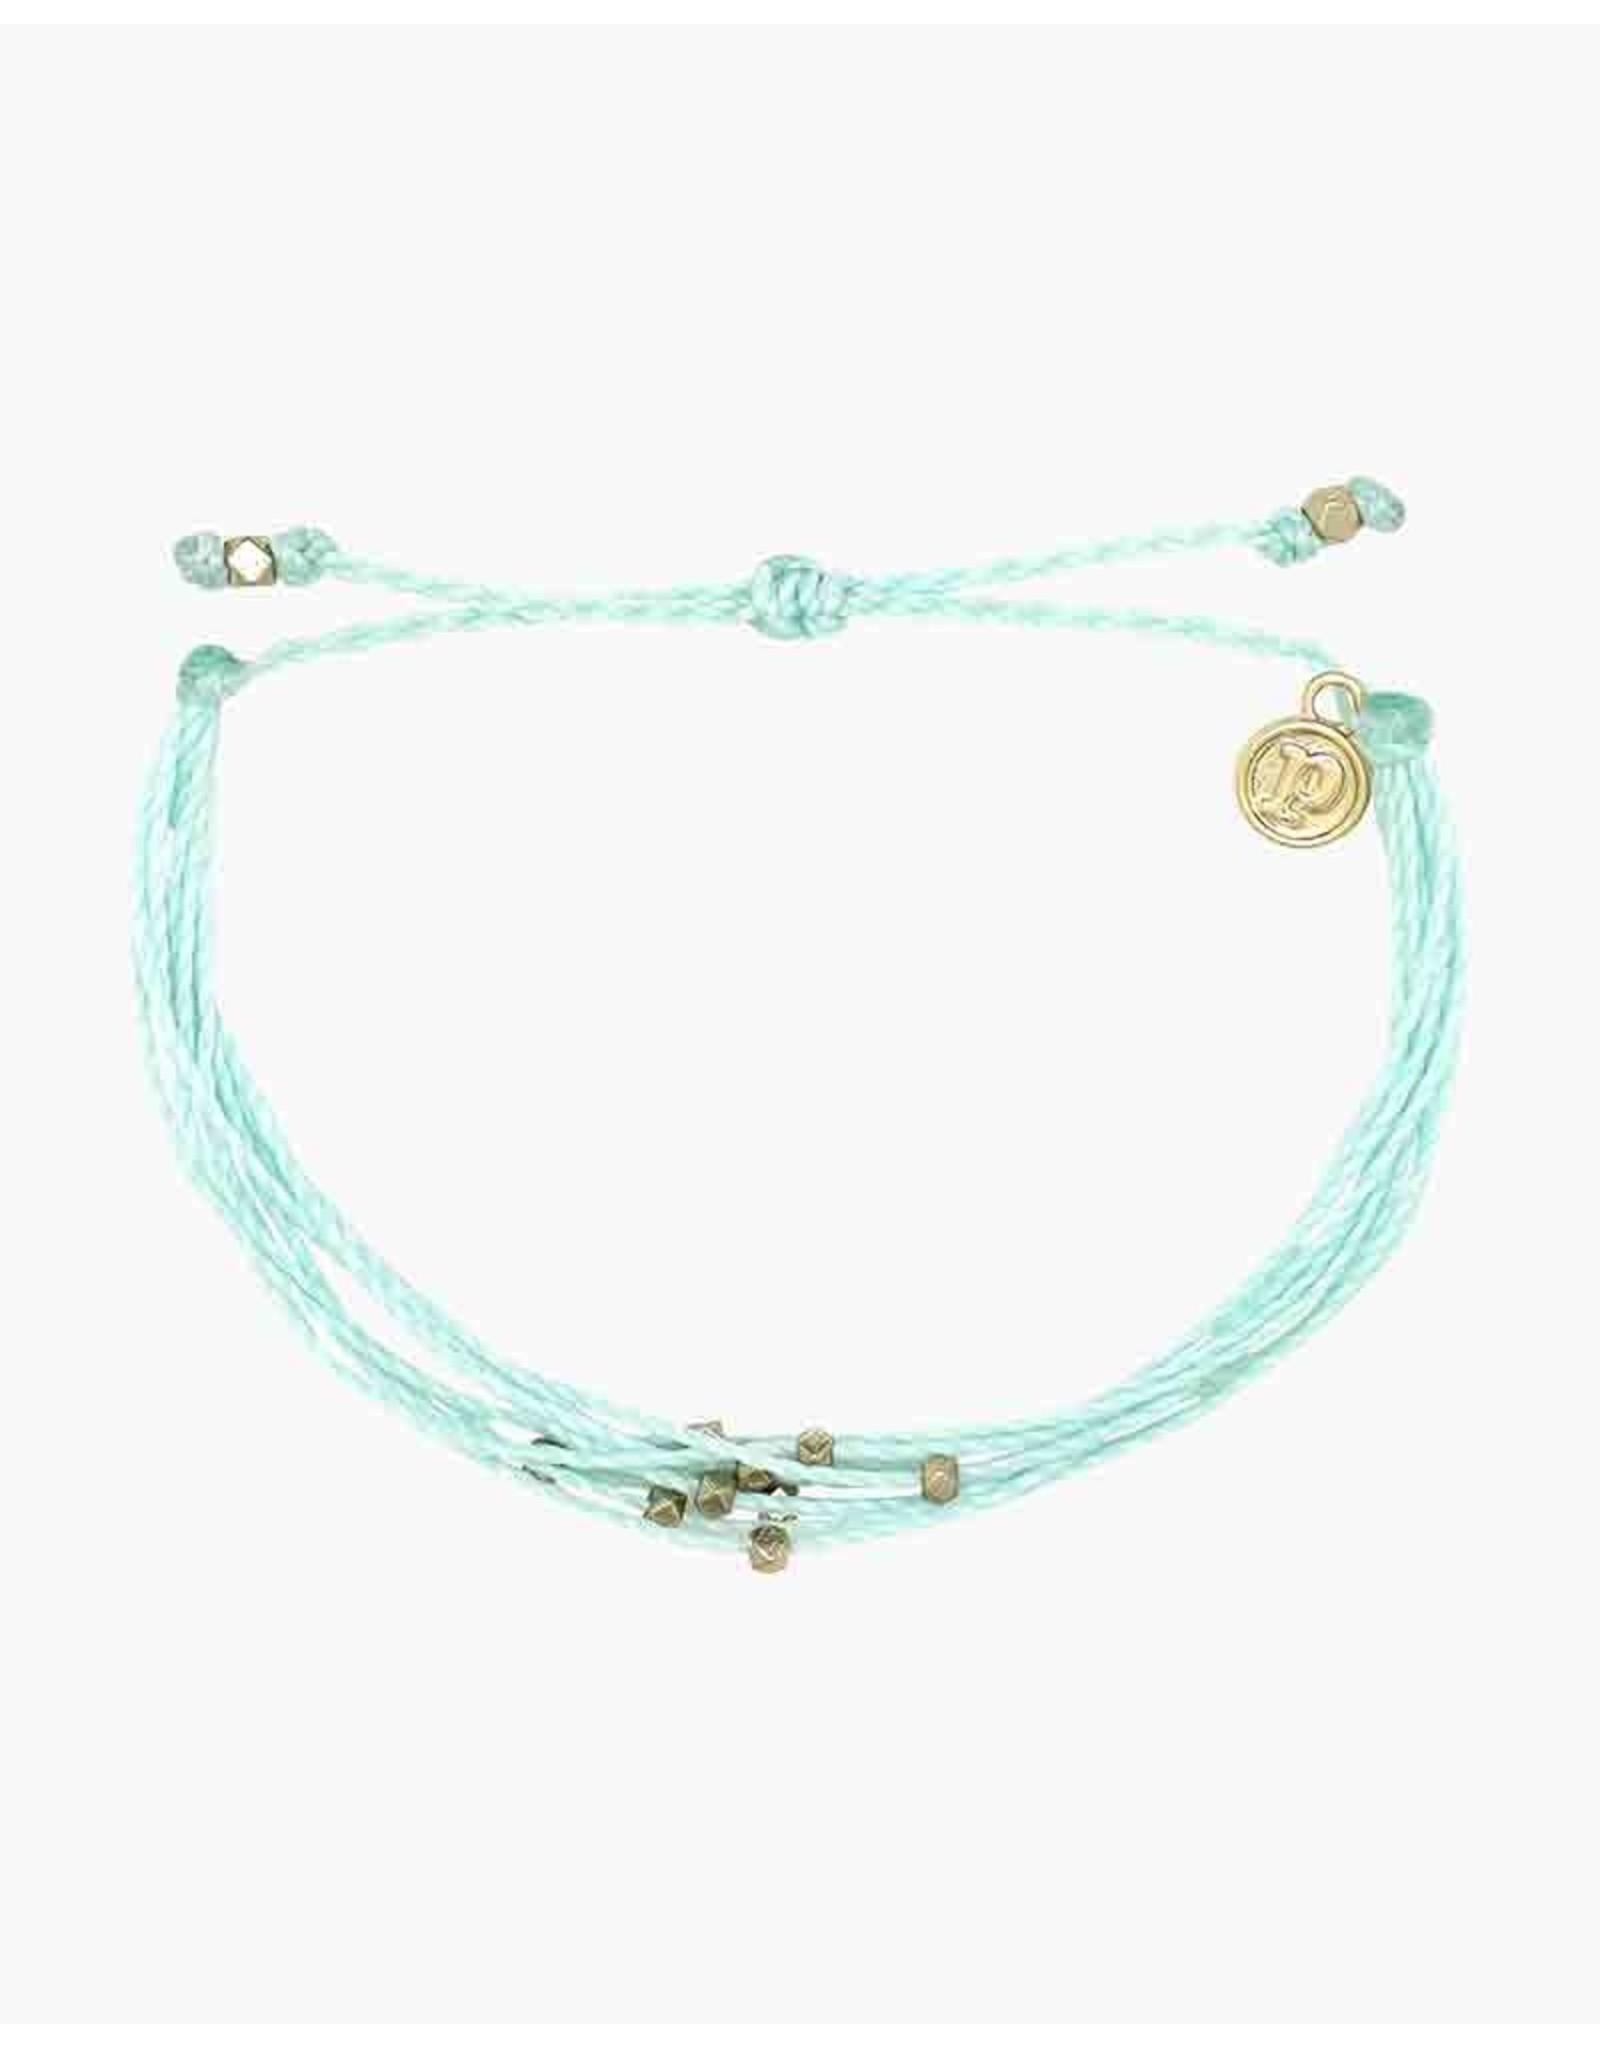 Pura Vida GOLD MALIBU Bracelet,  WINTER